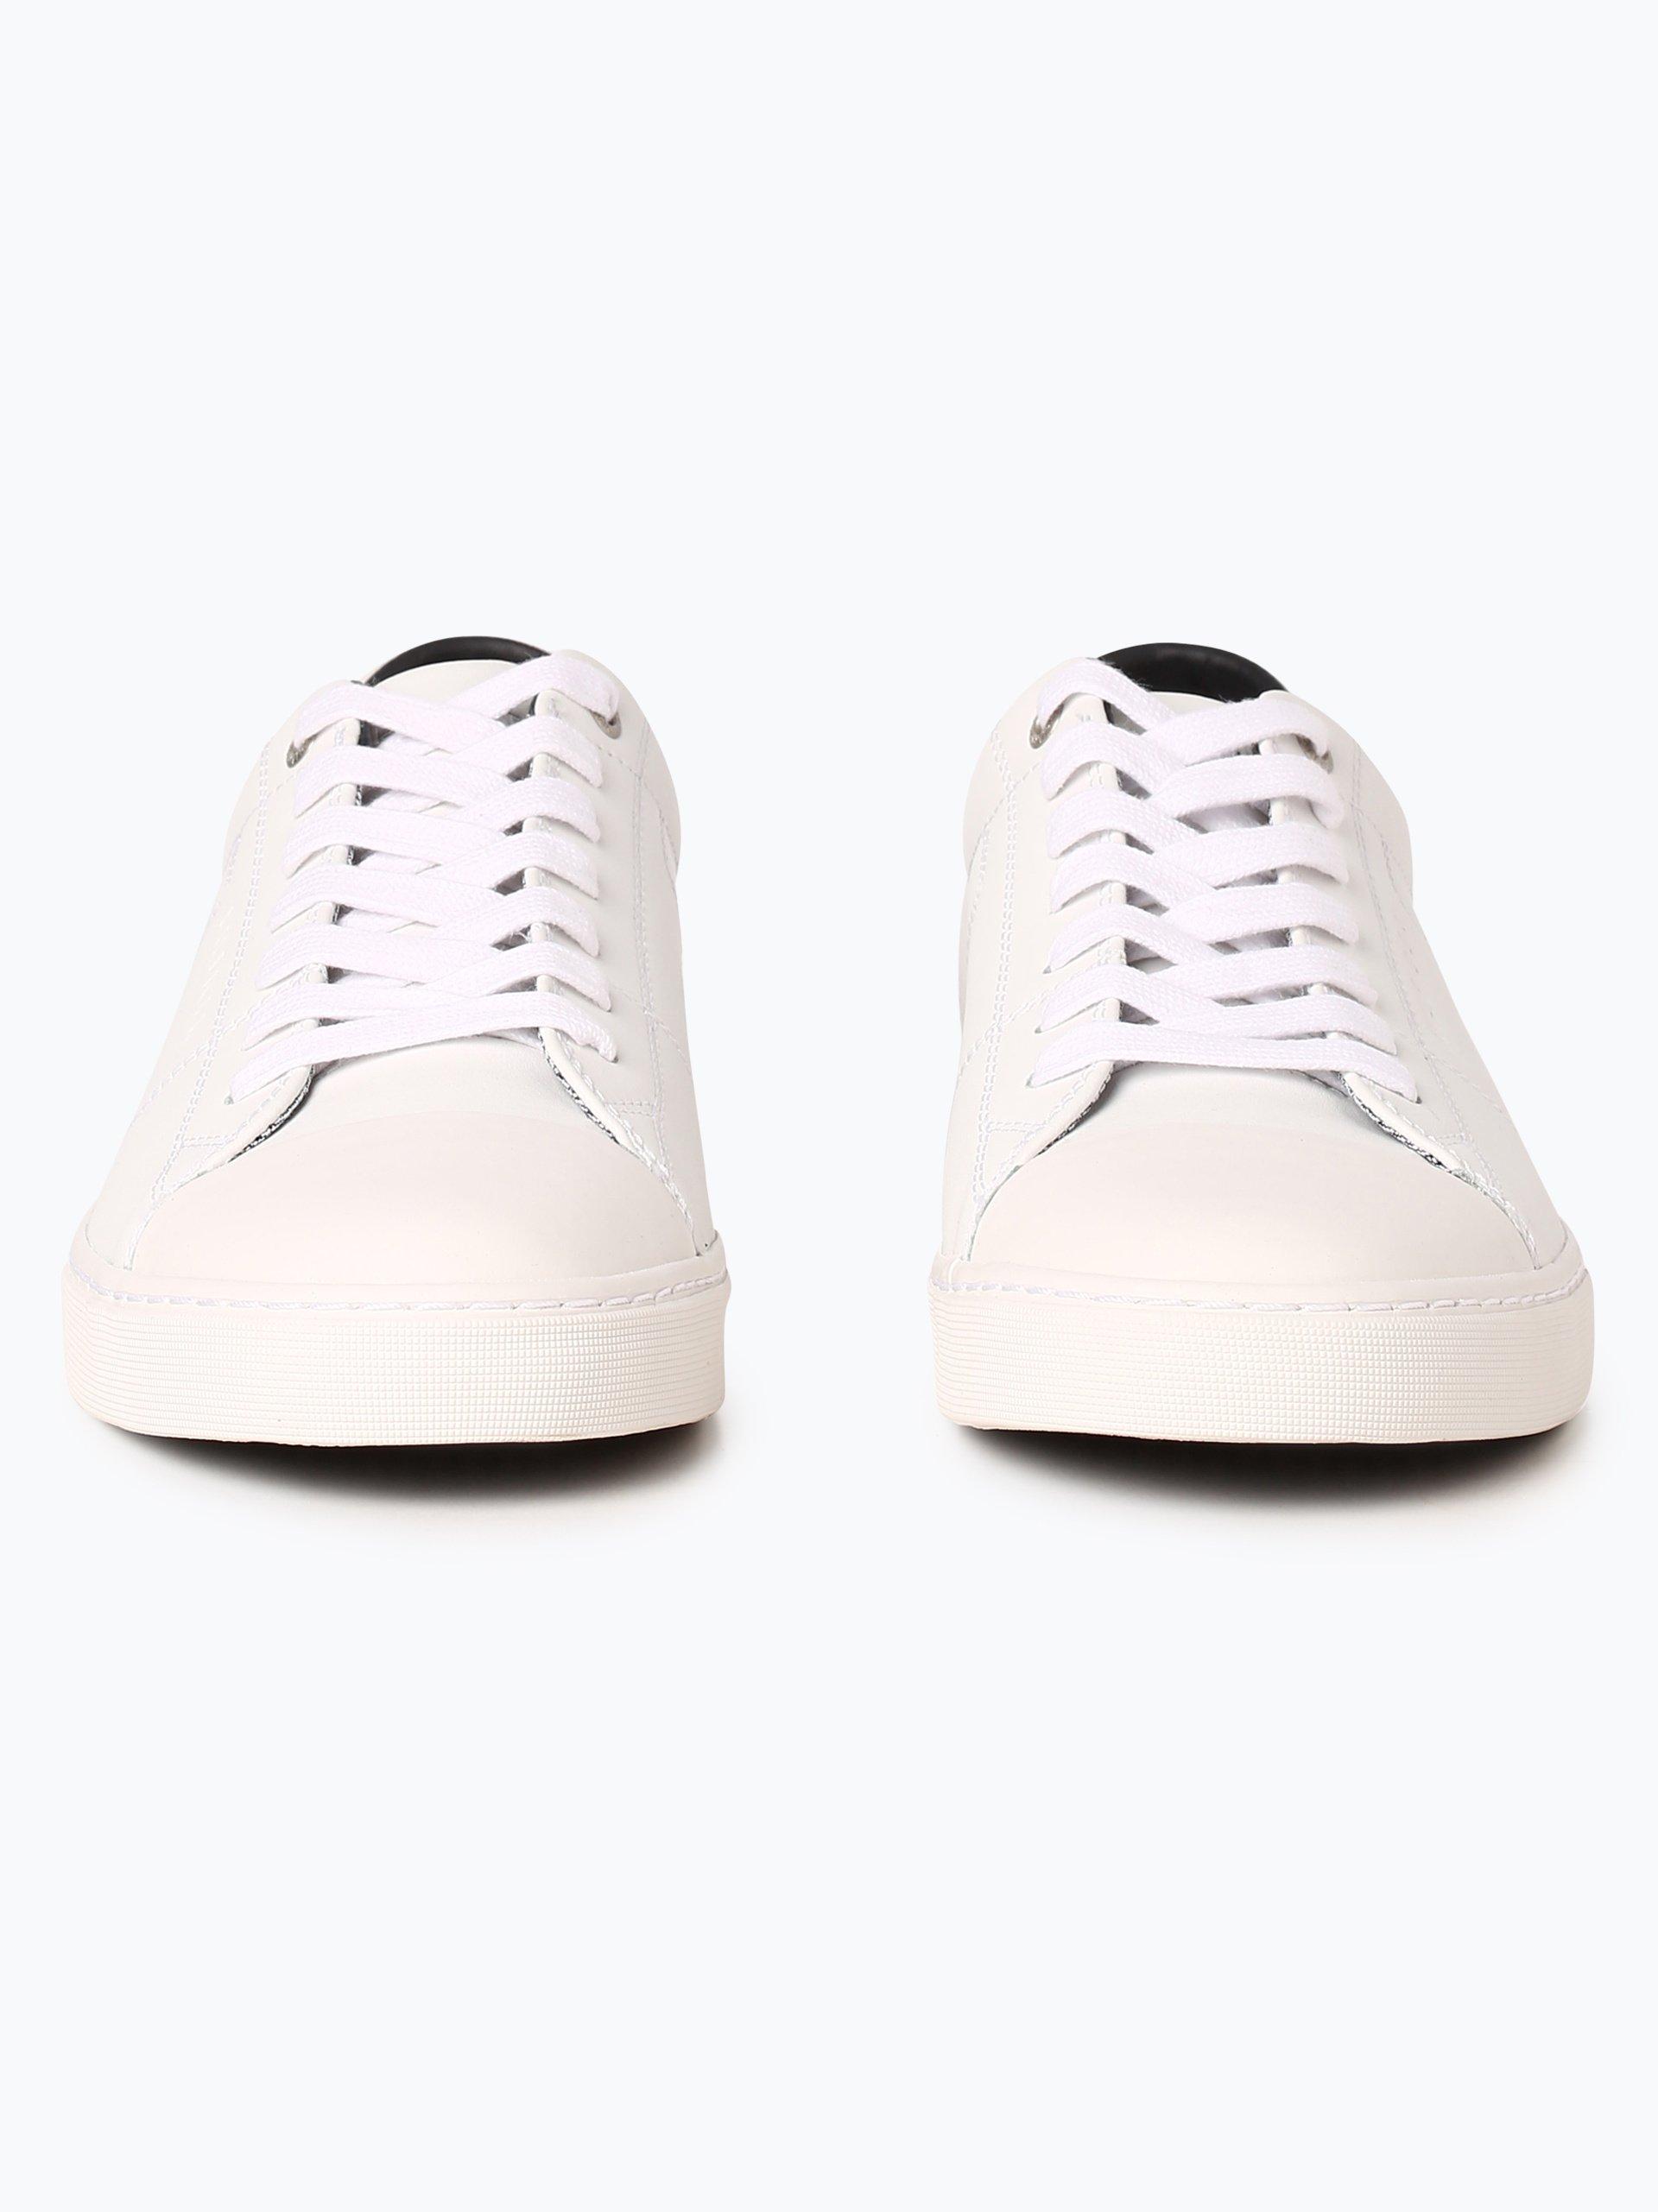 tommy hilfiger herren sneaker aus leder jay 2 online kaufen peek und cloppenburg de. Black Bedroom Furniture Sets. Home Design Ideas